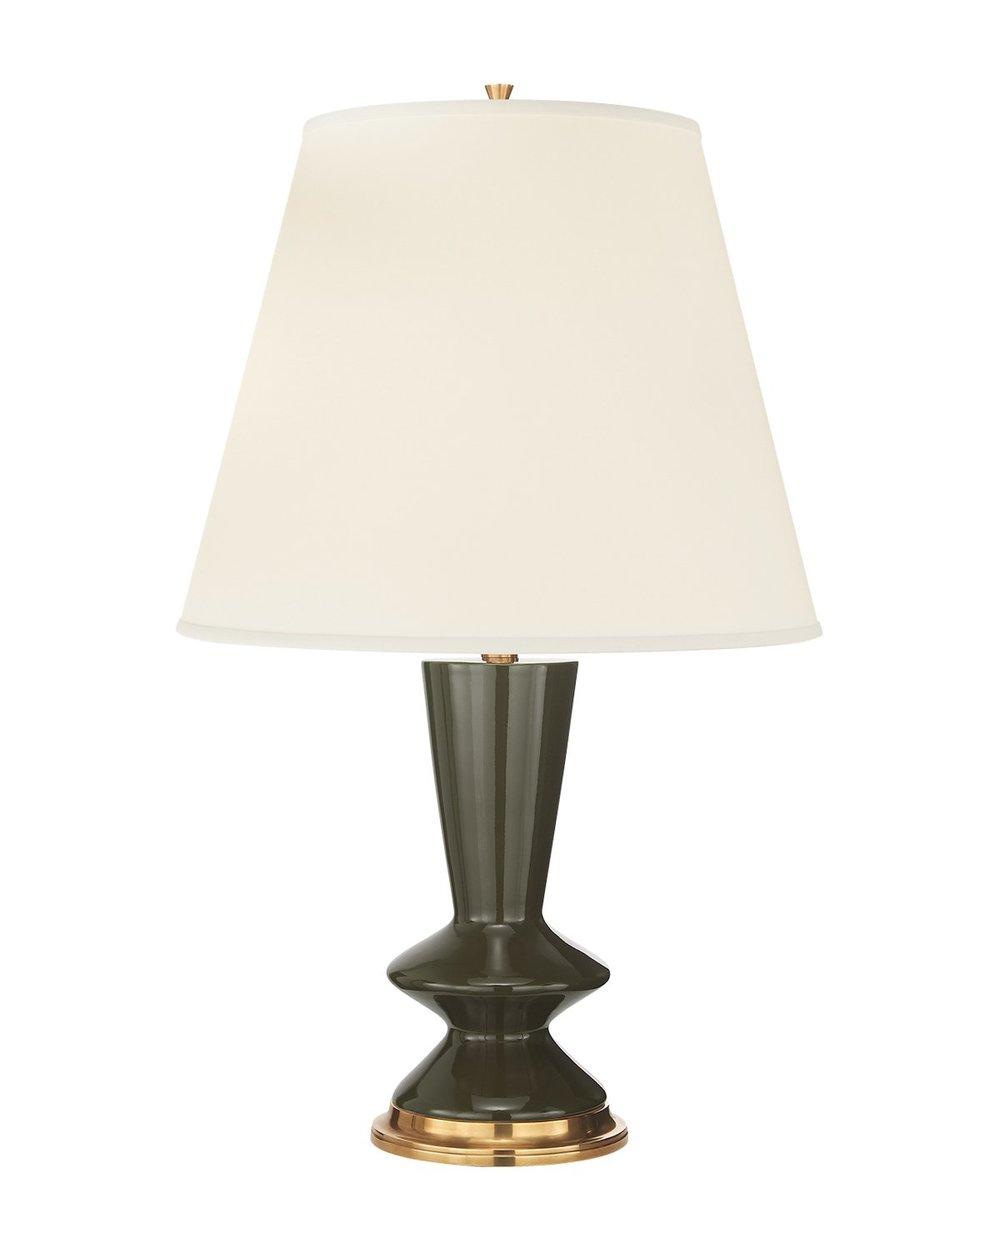 Arpel_Table_Lamp_1.jpg